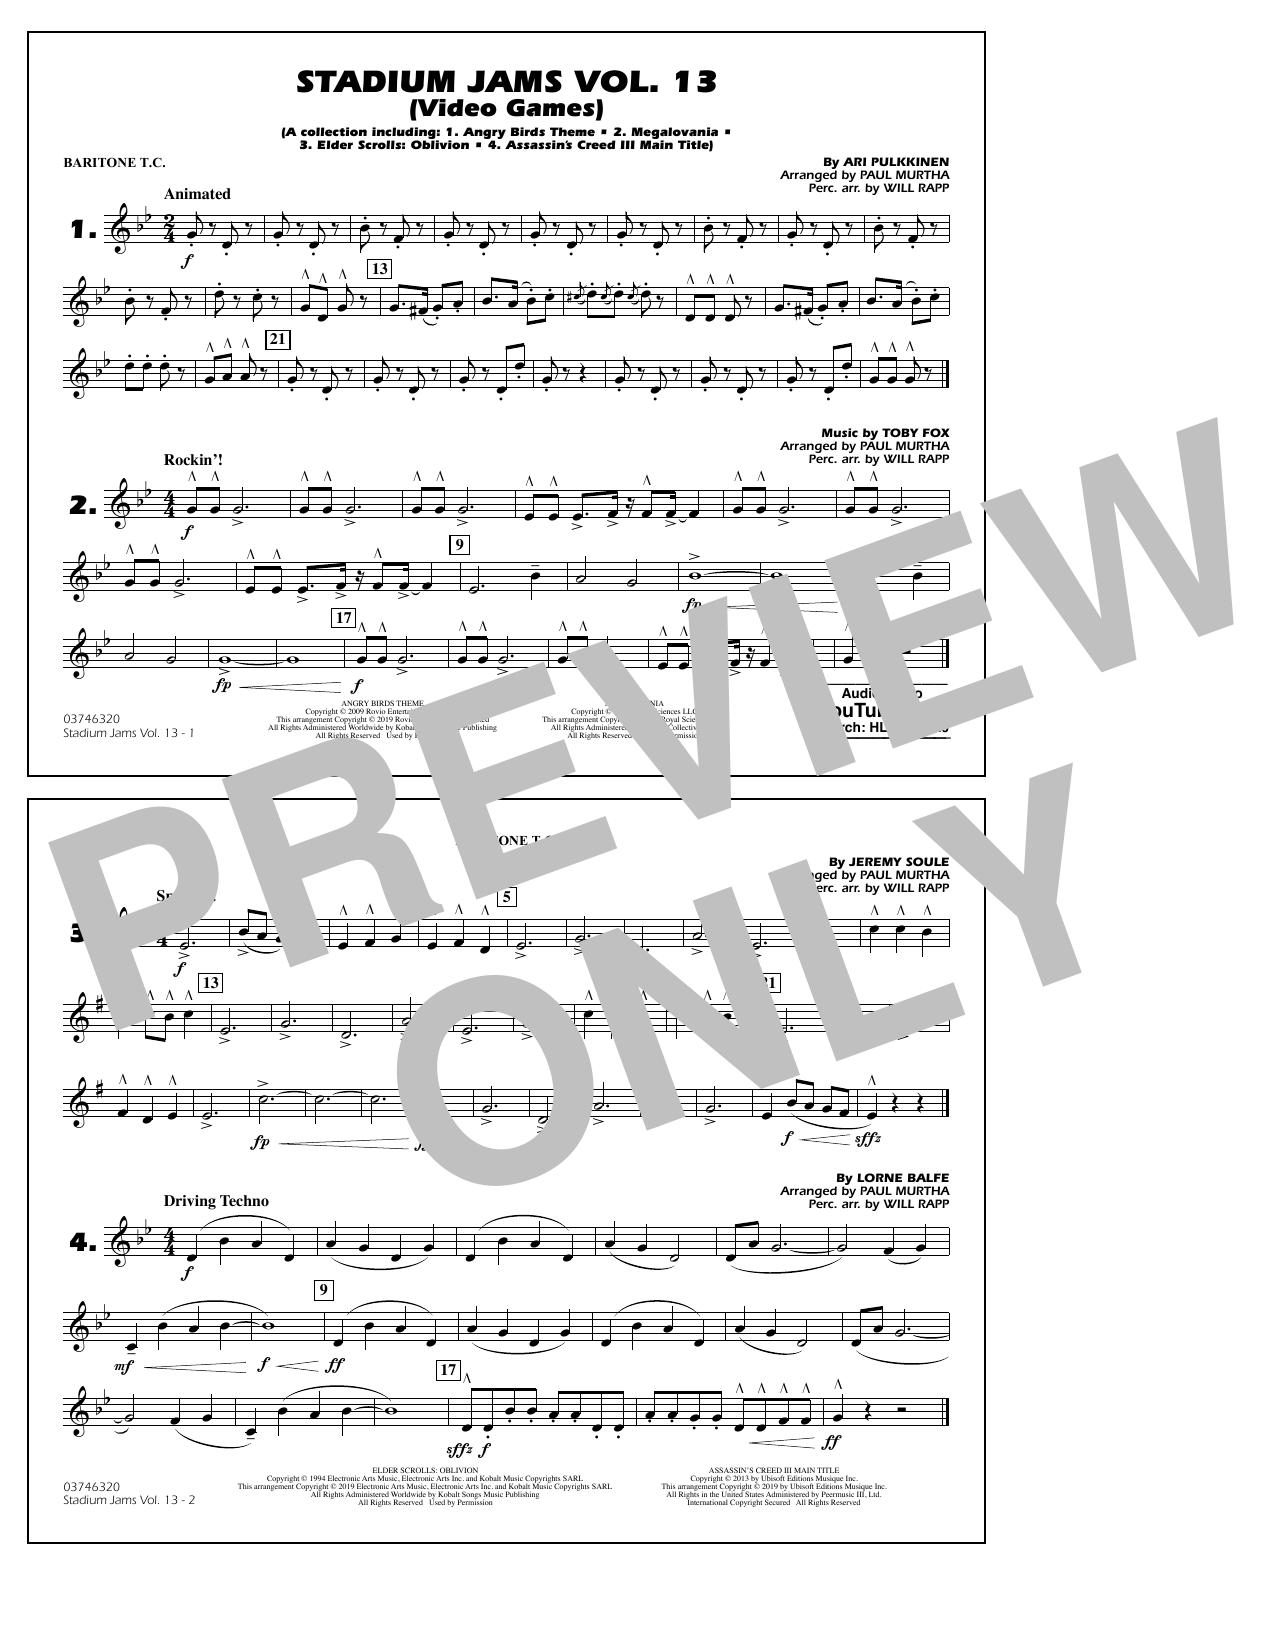 Stadium Jams Volume 13 (Video Games) - Baritone T.C. (Marching Band)